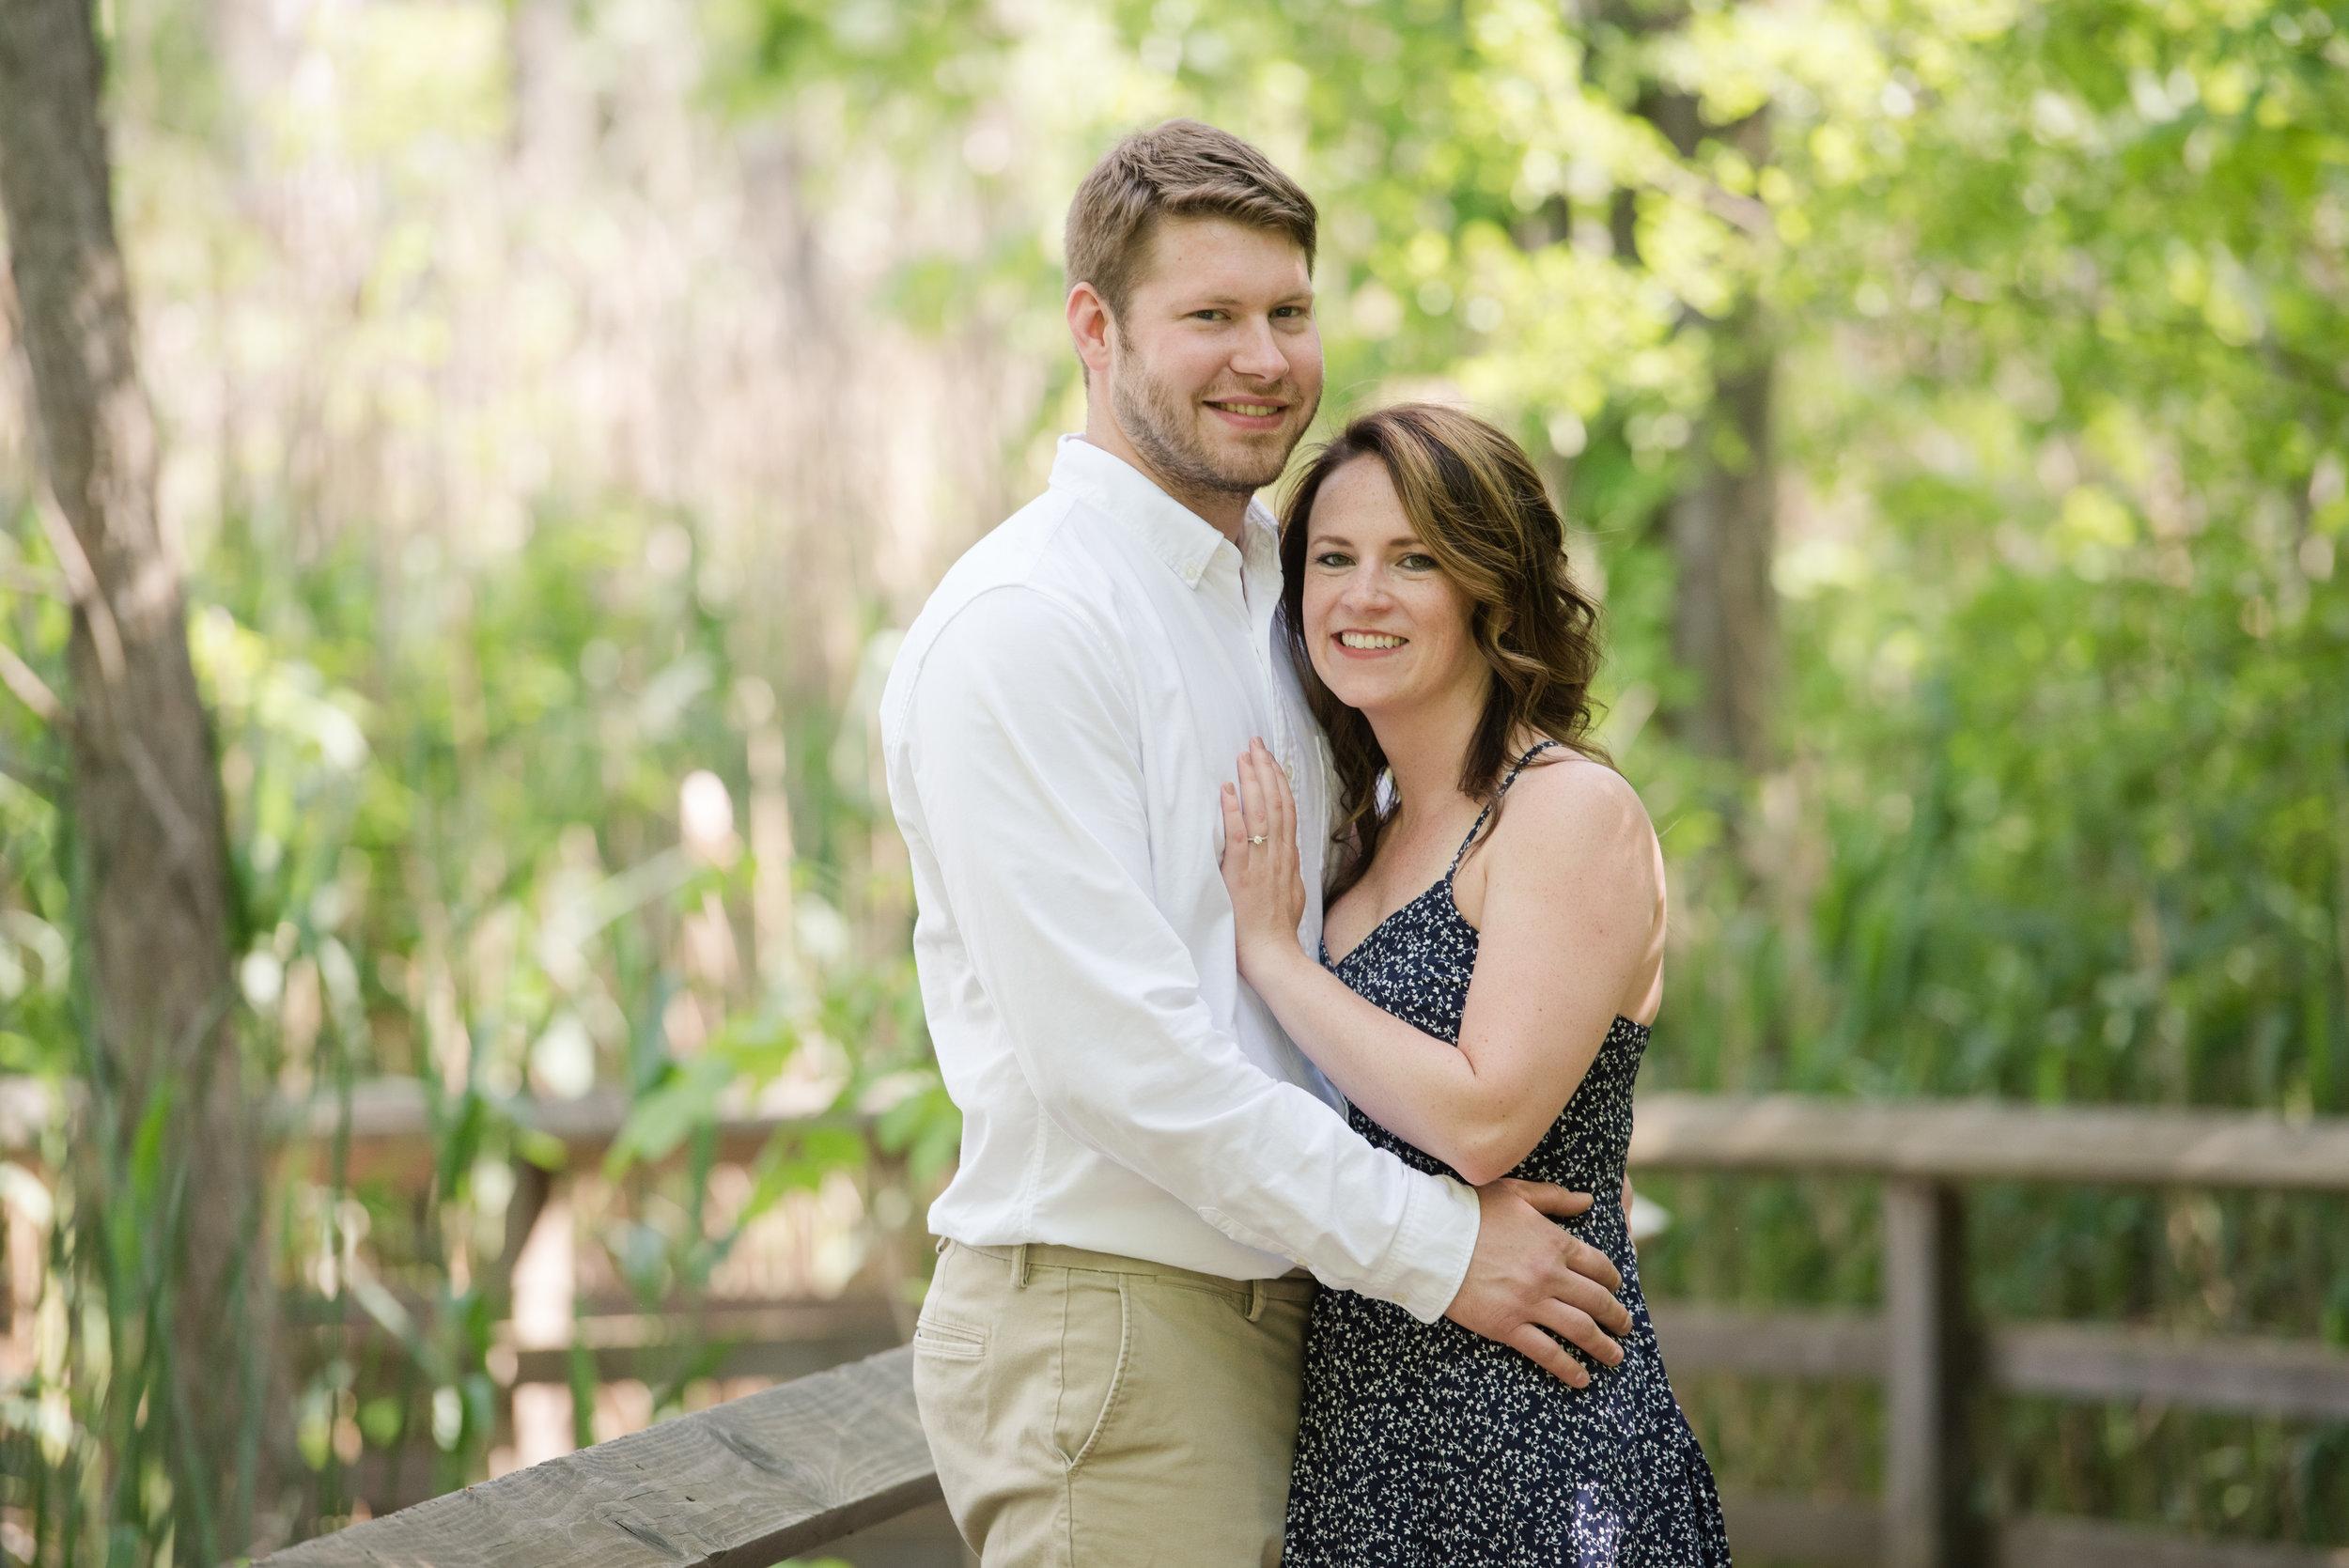 GALLERY-2019-6-9 Kaitlin, Justin & Liam Engagement 0750 112.jpg